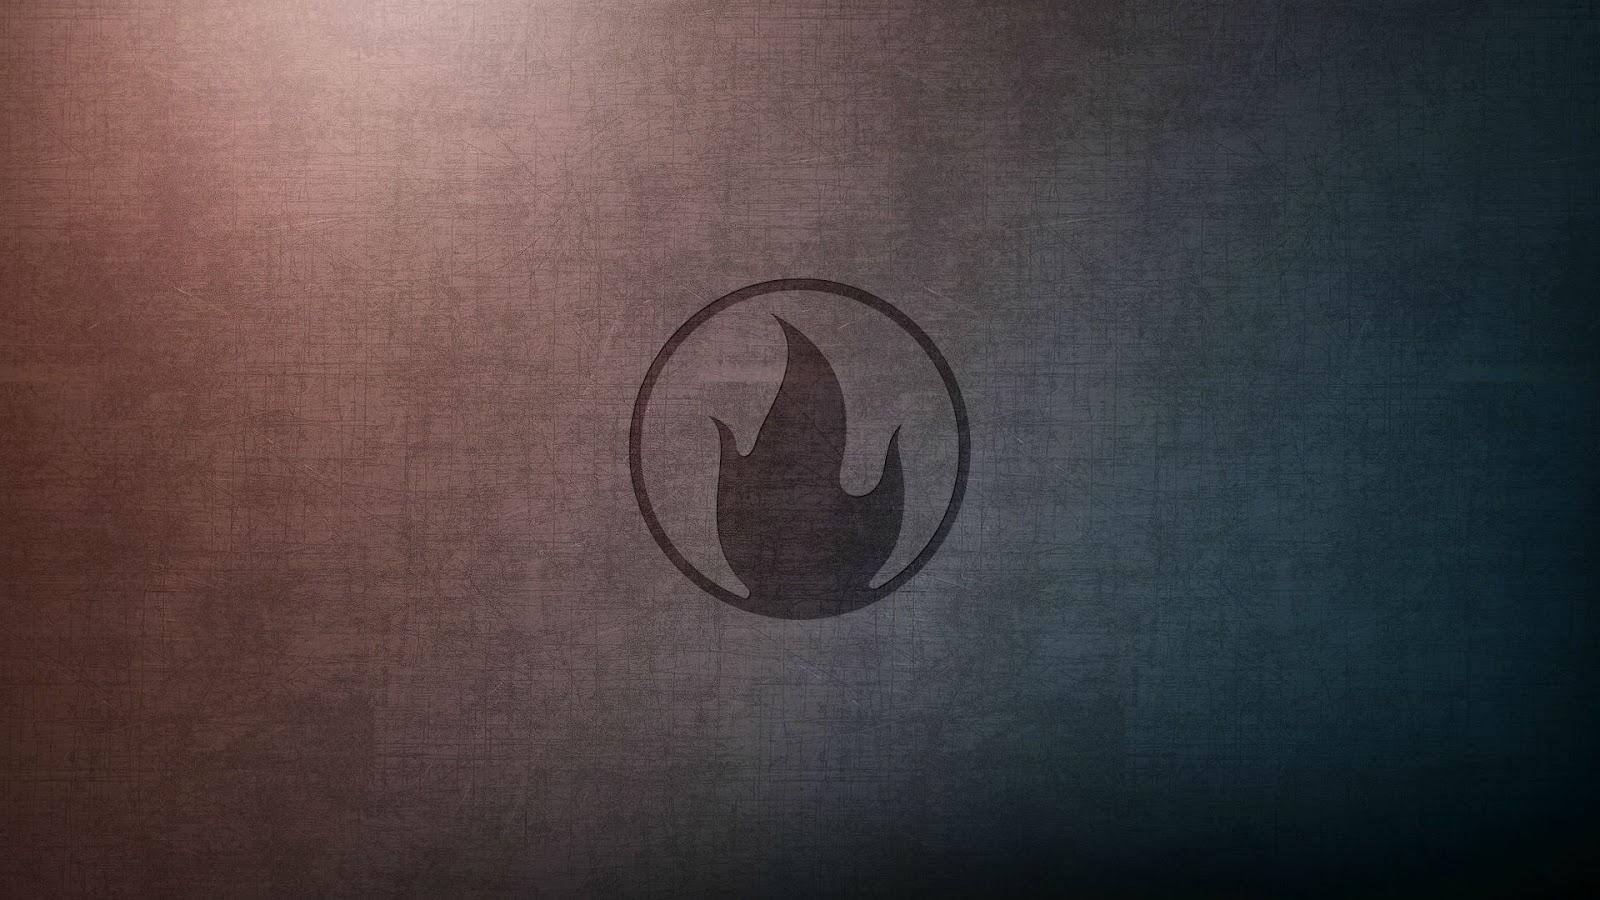 Team Fortress 2 Tf2 のハイクオリティな壁紙 Game Or Die